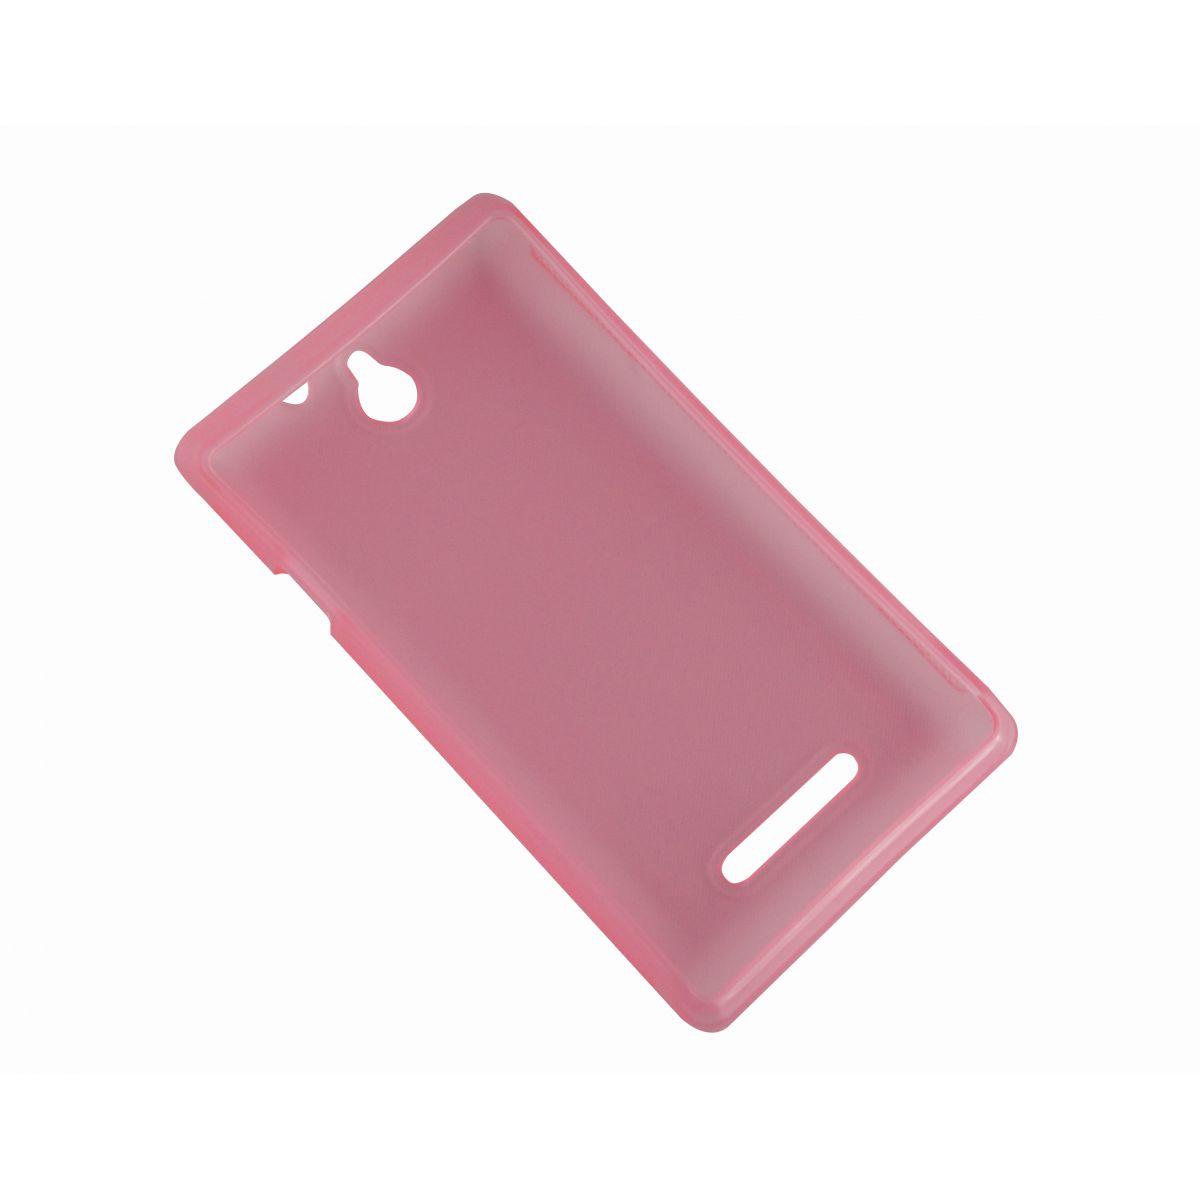 Capa TPU Rosa Sony Xperia E C1604 C1605 + Película Flexível